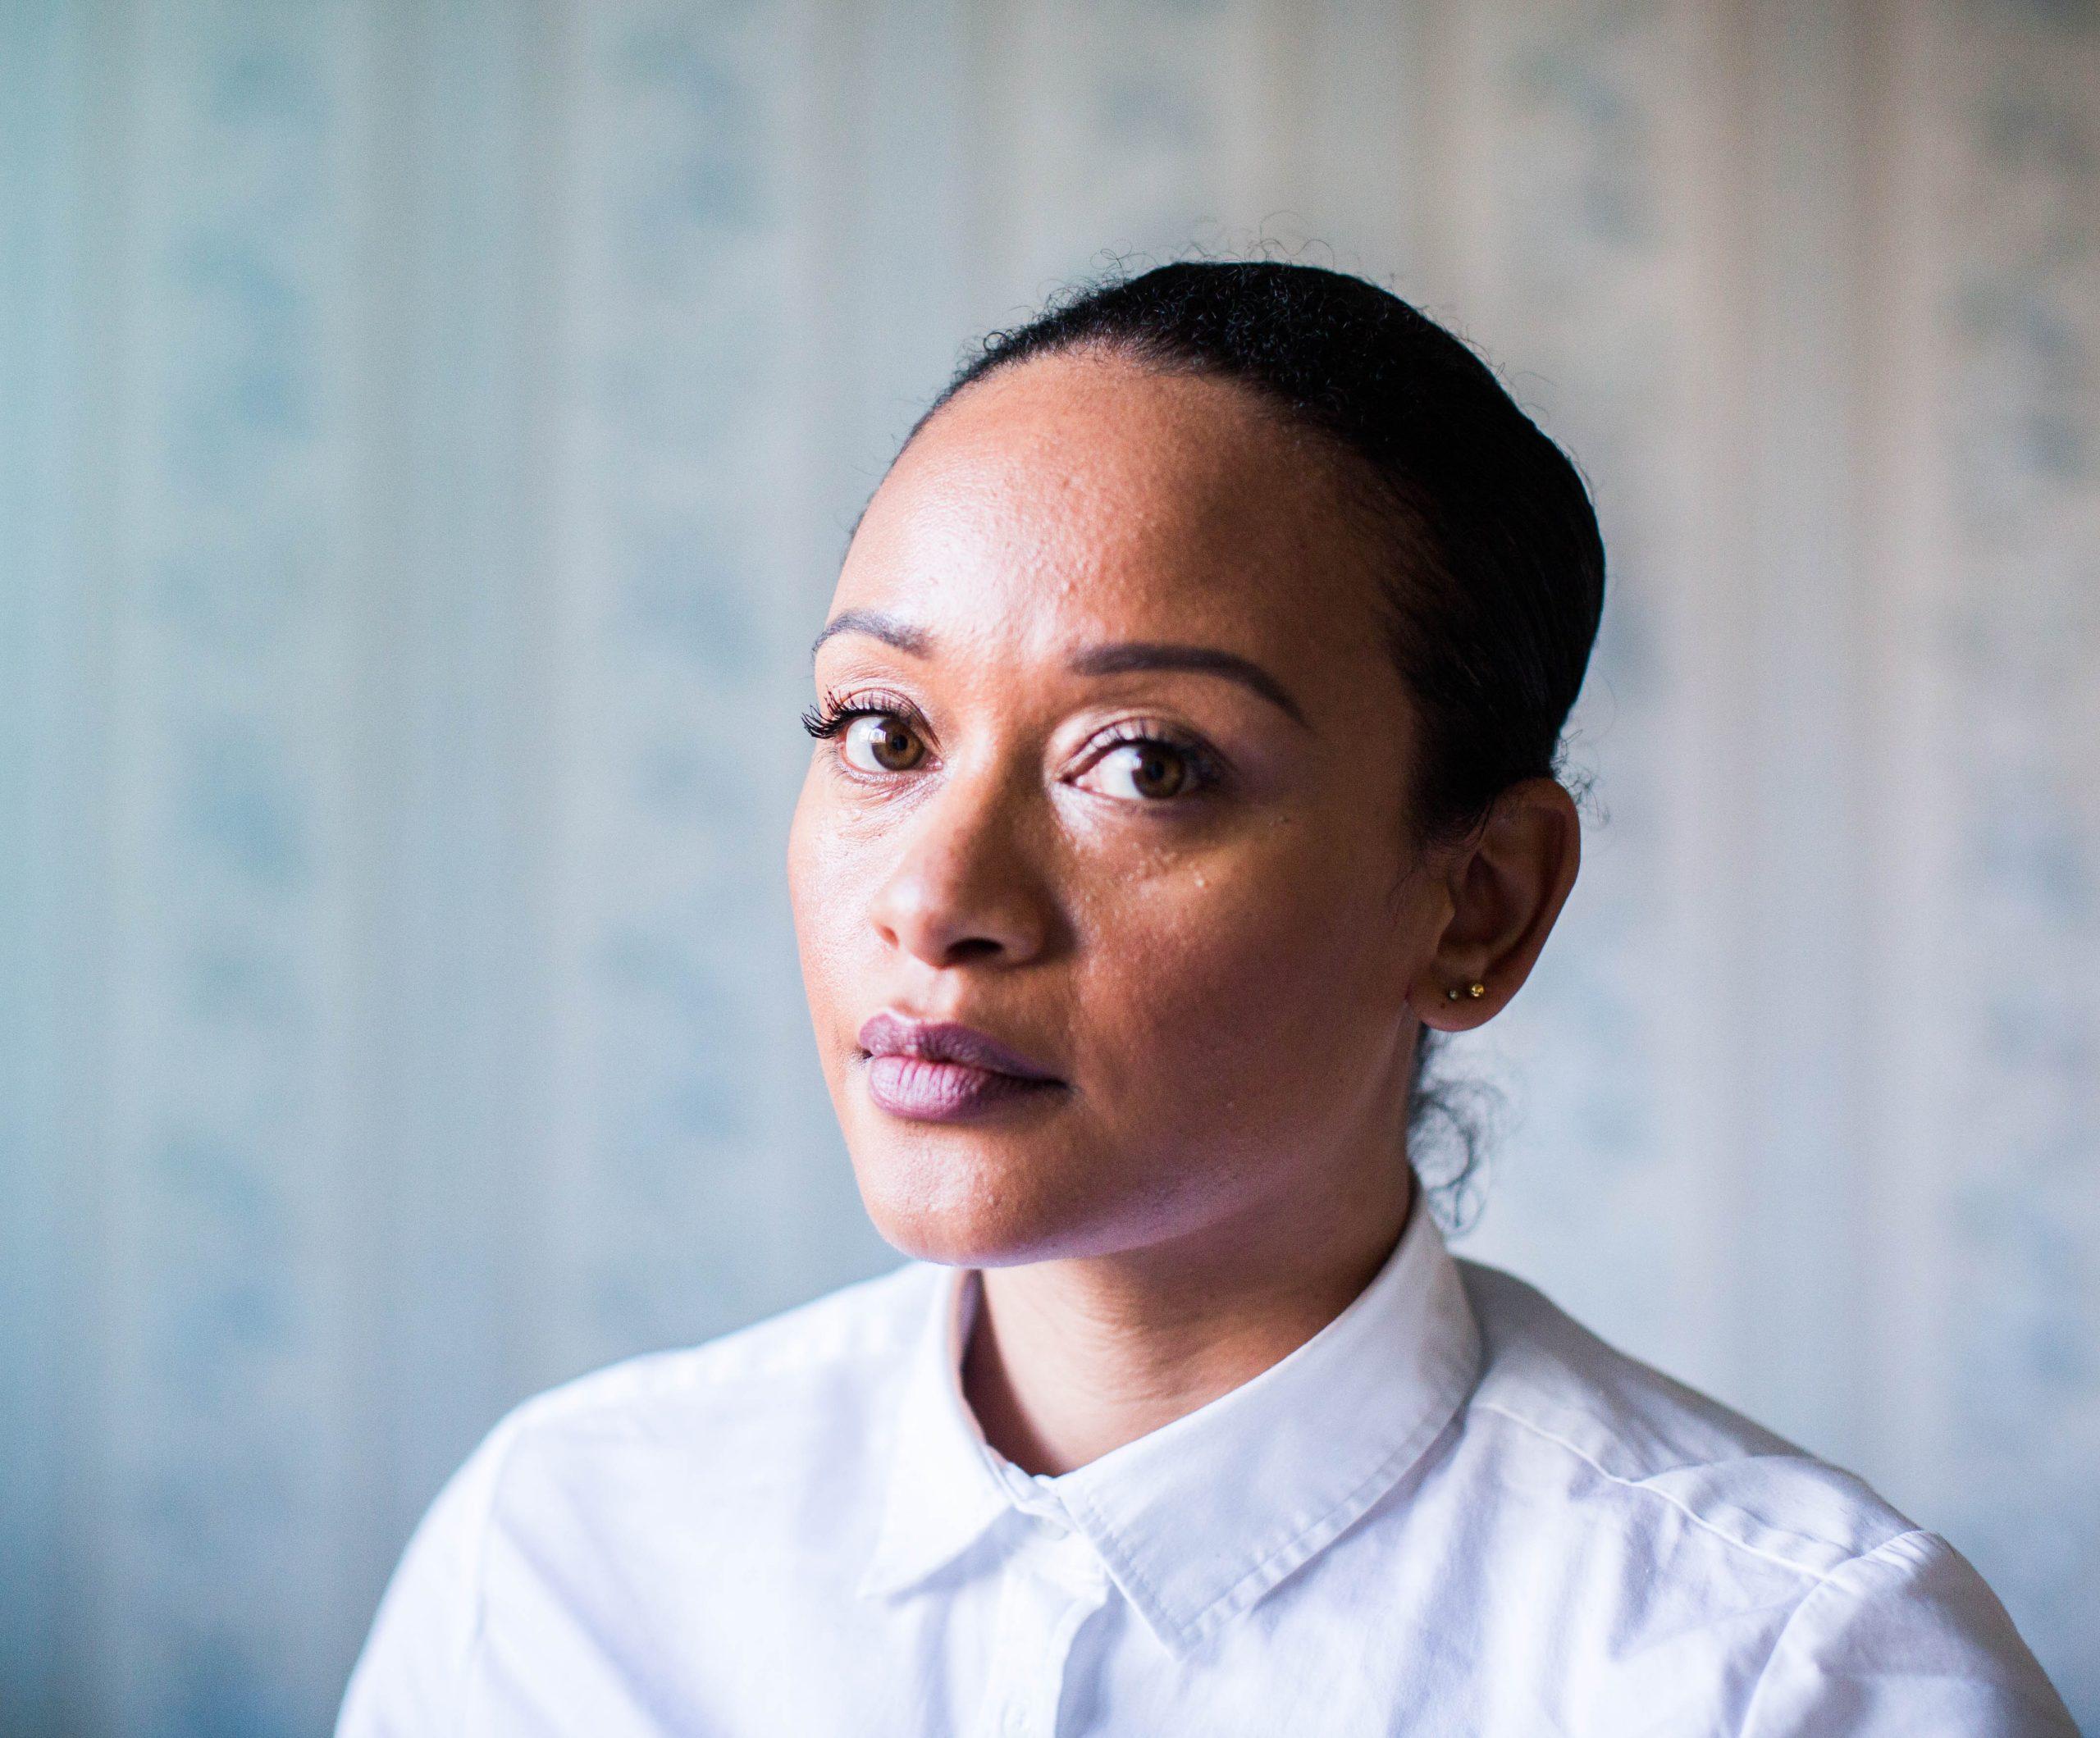 black-woman-thinking-contemplating